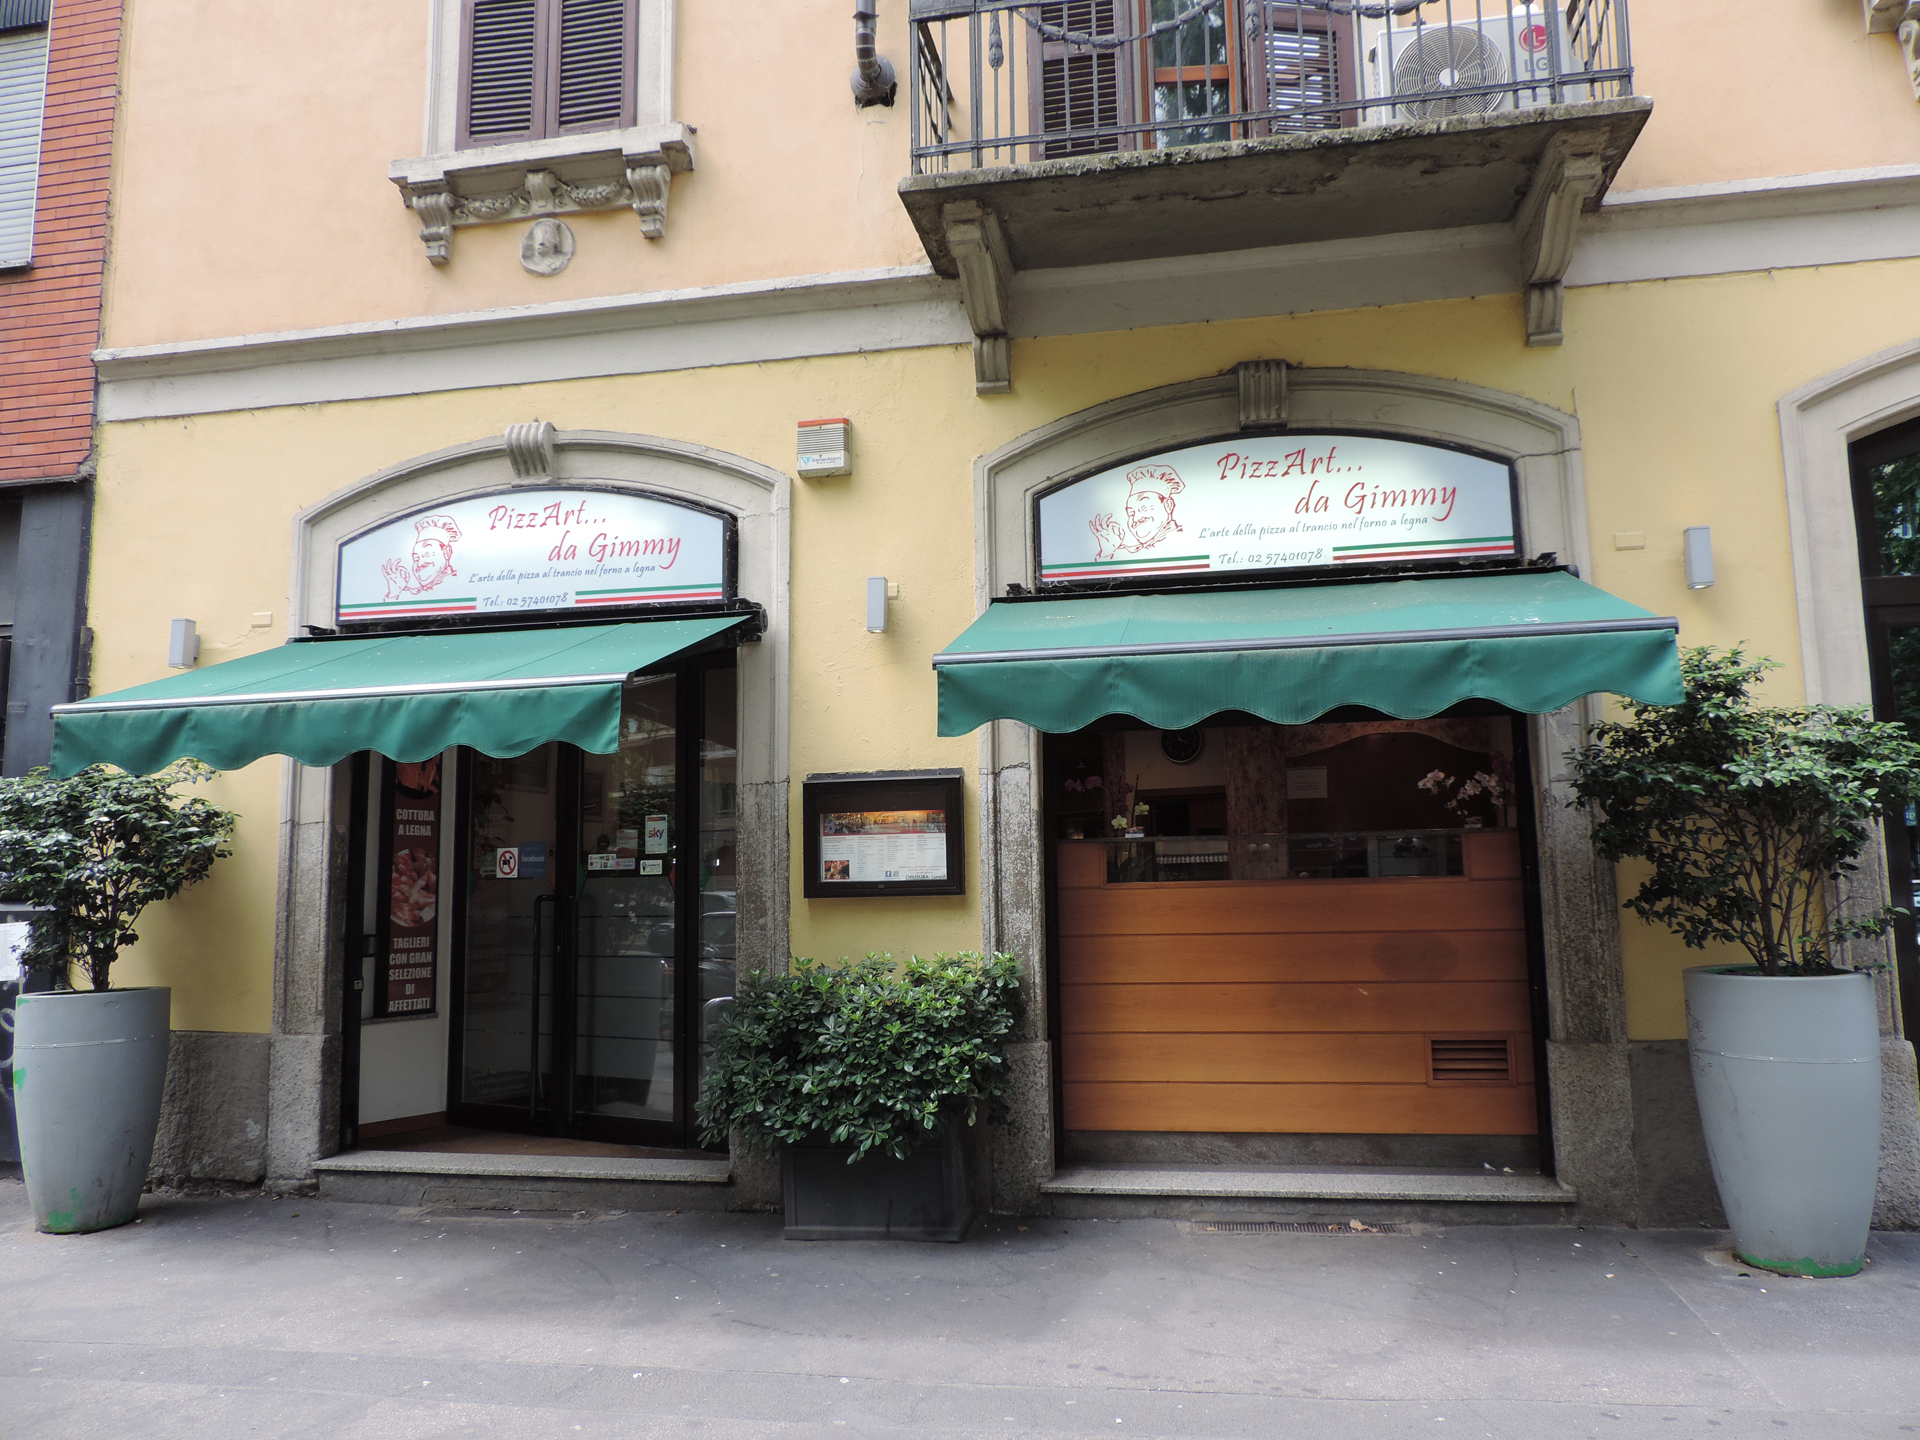 Pizza-al-trancio-pizzart_Da-Gimmy-Milano_www.italyengine.it (2)